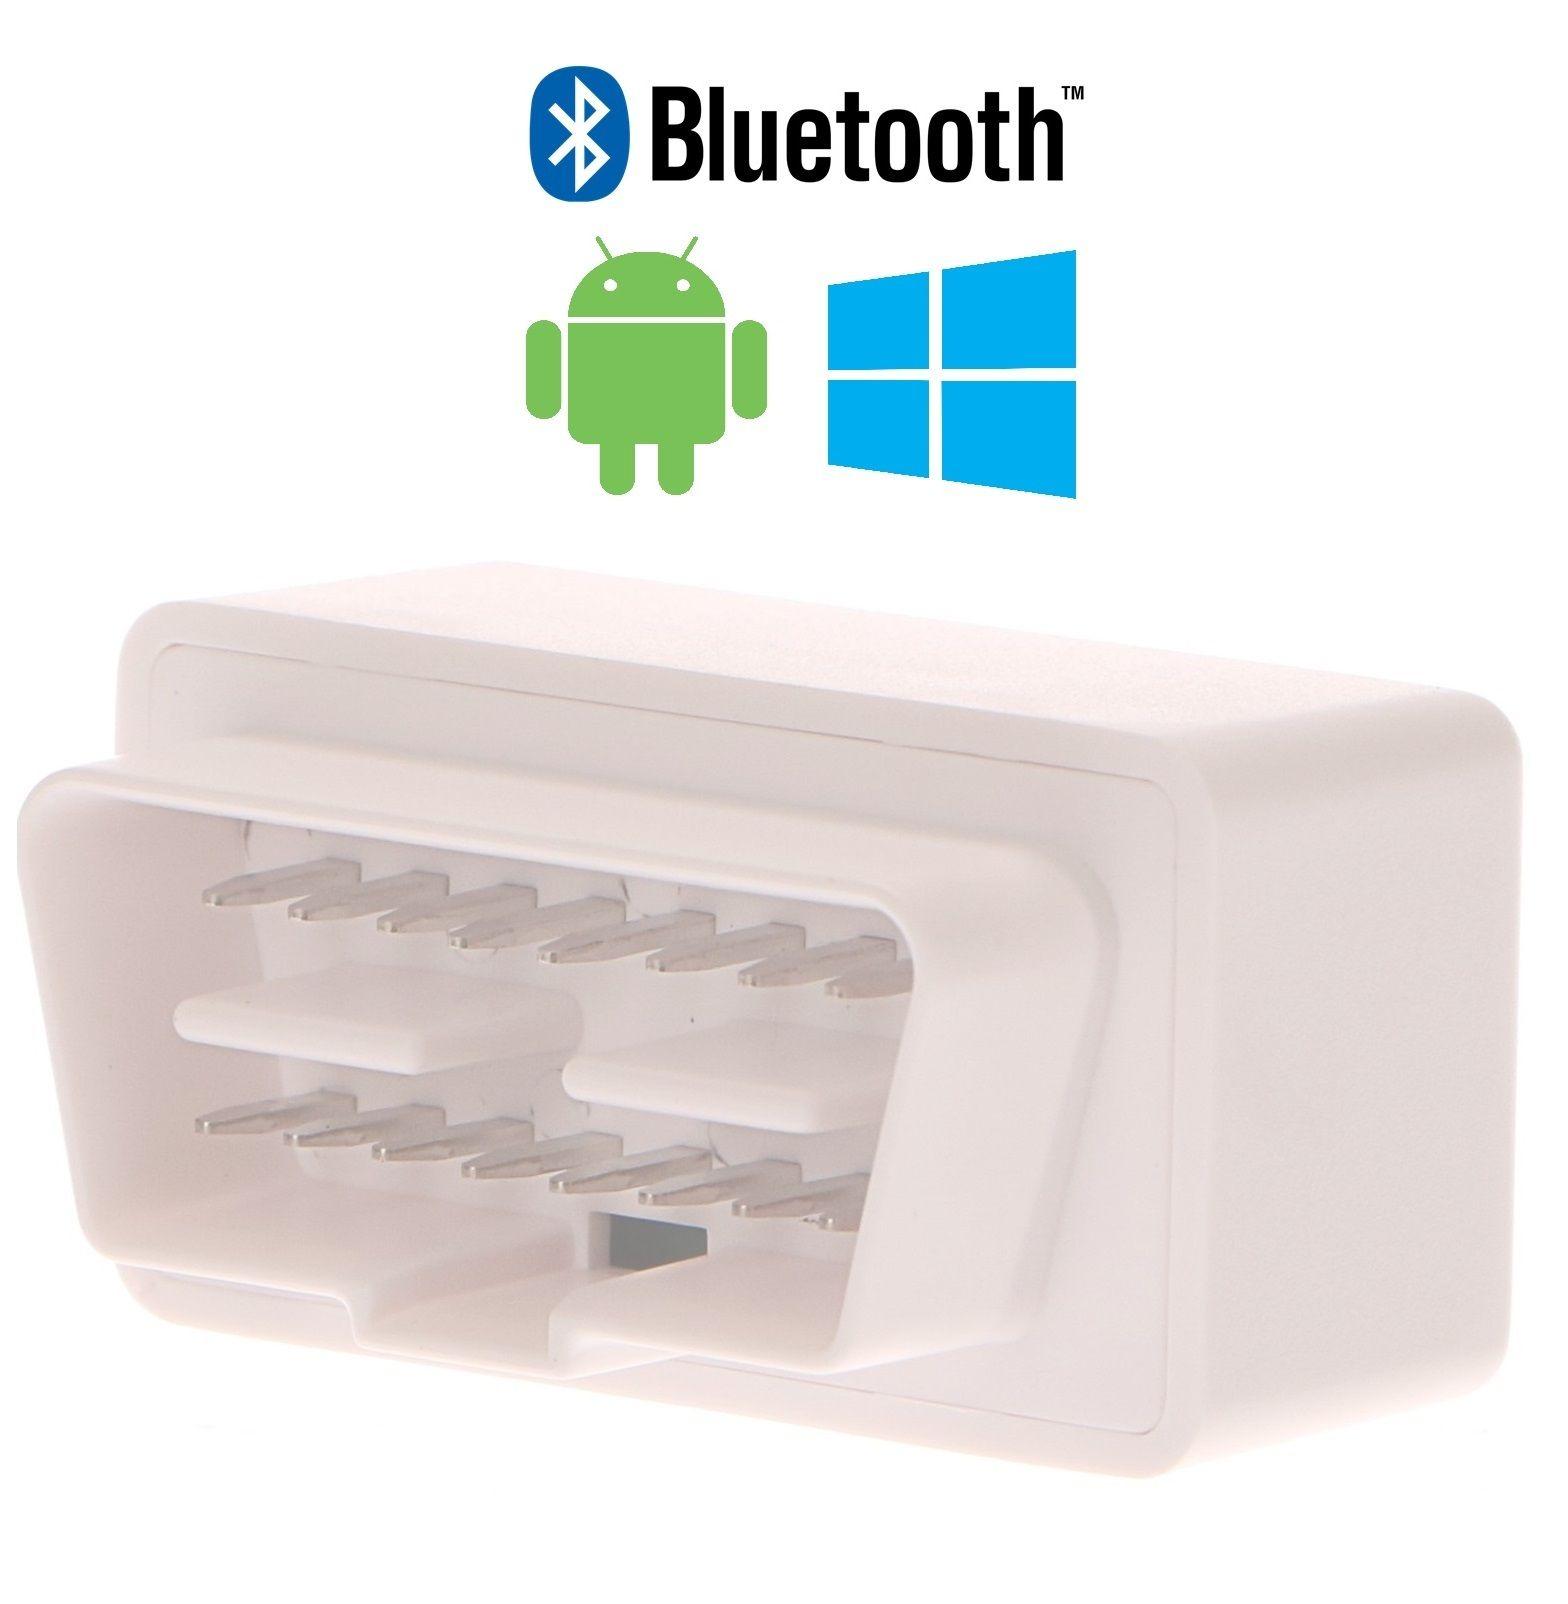 Autodiagnostika SX1 bluetooth bílá, Android, Windows